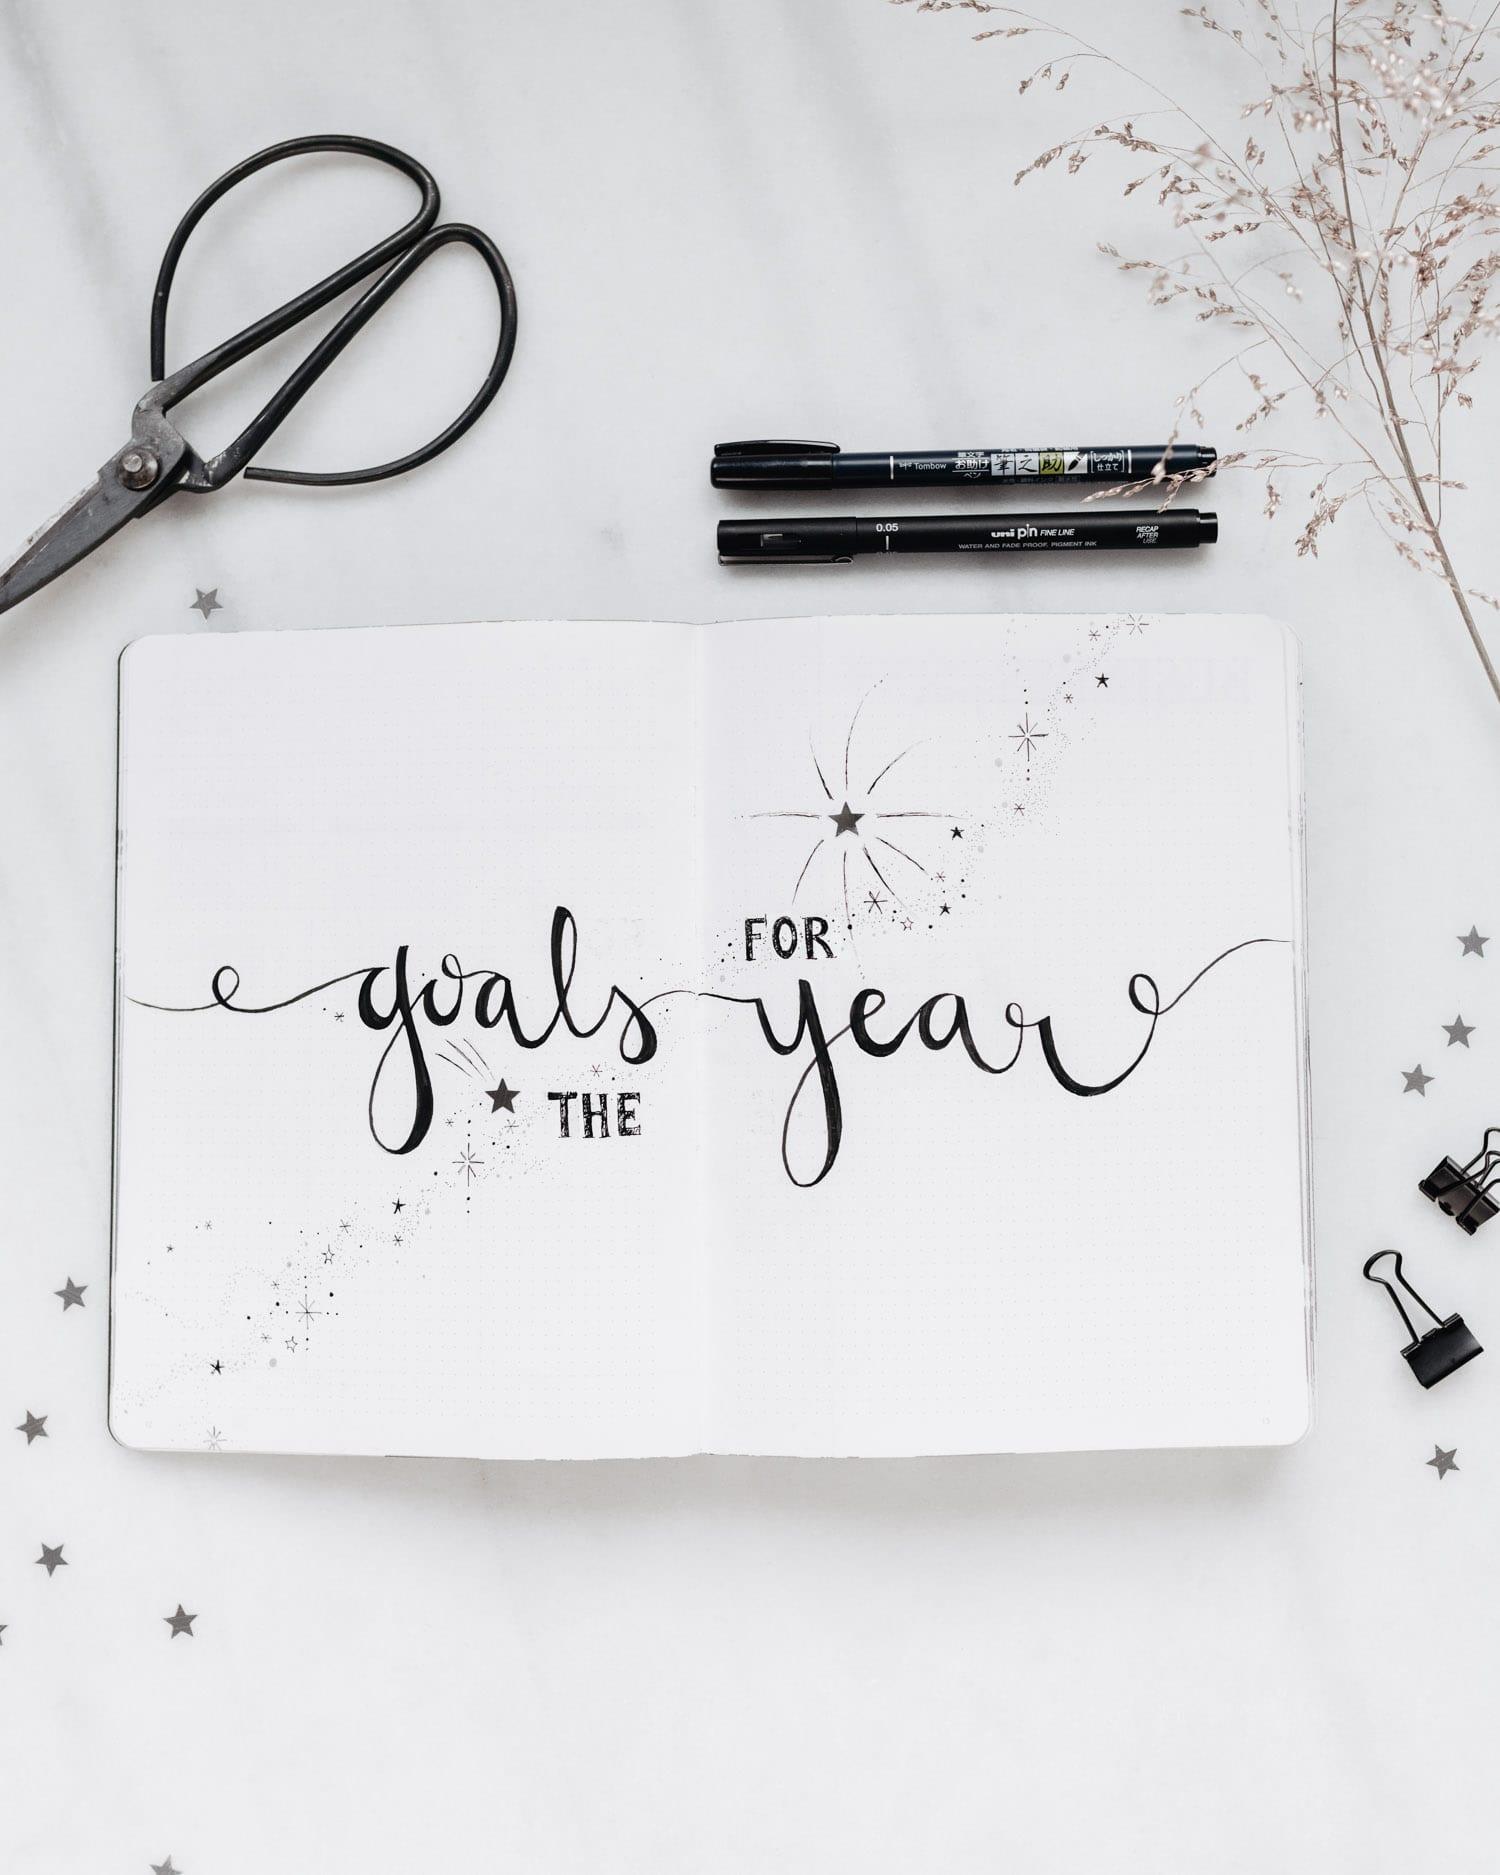 Bullet Journal - Årliga mål (Goals for the Year)